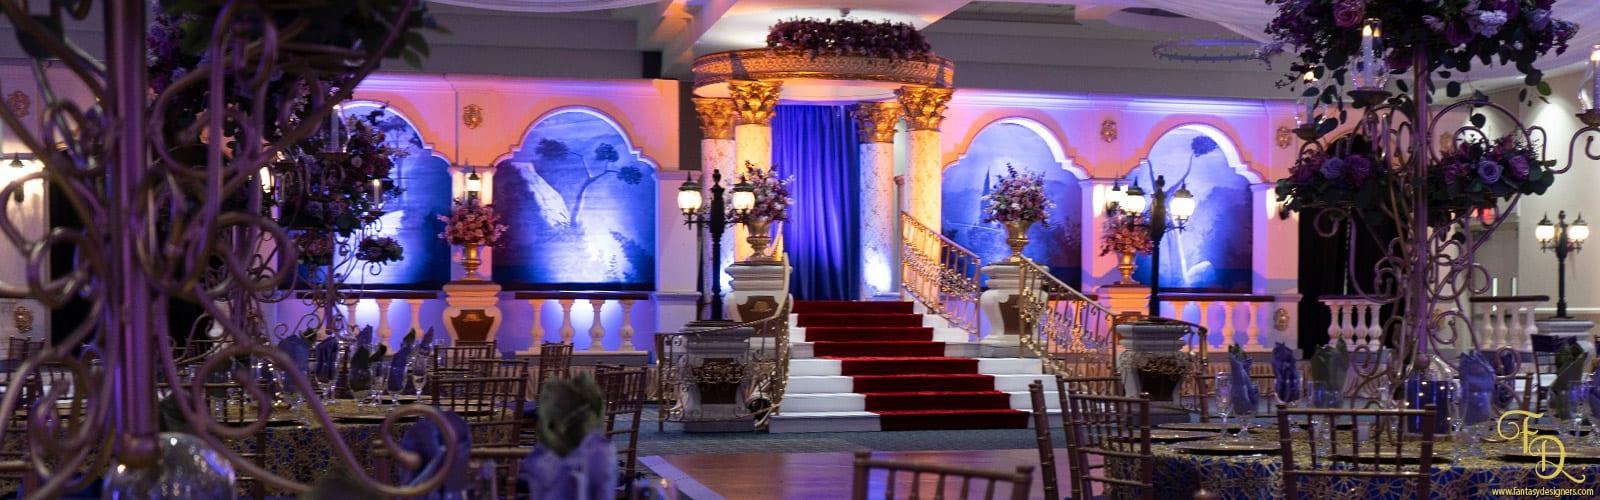 wedding Decorations stage miami fantasy designers